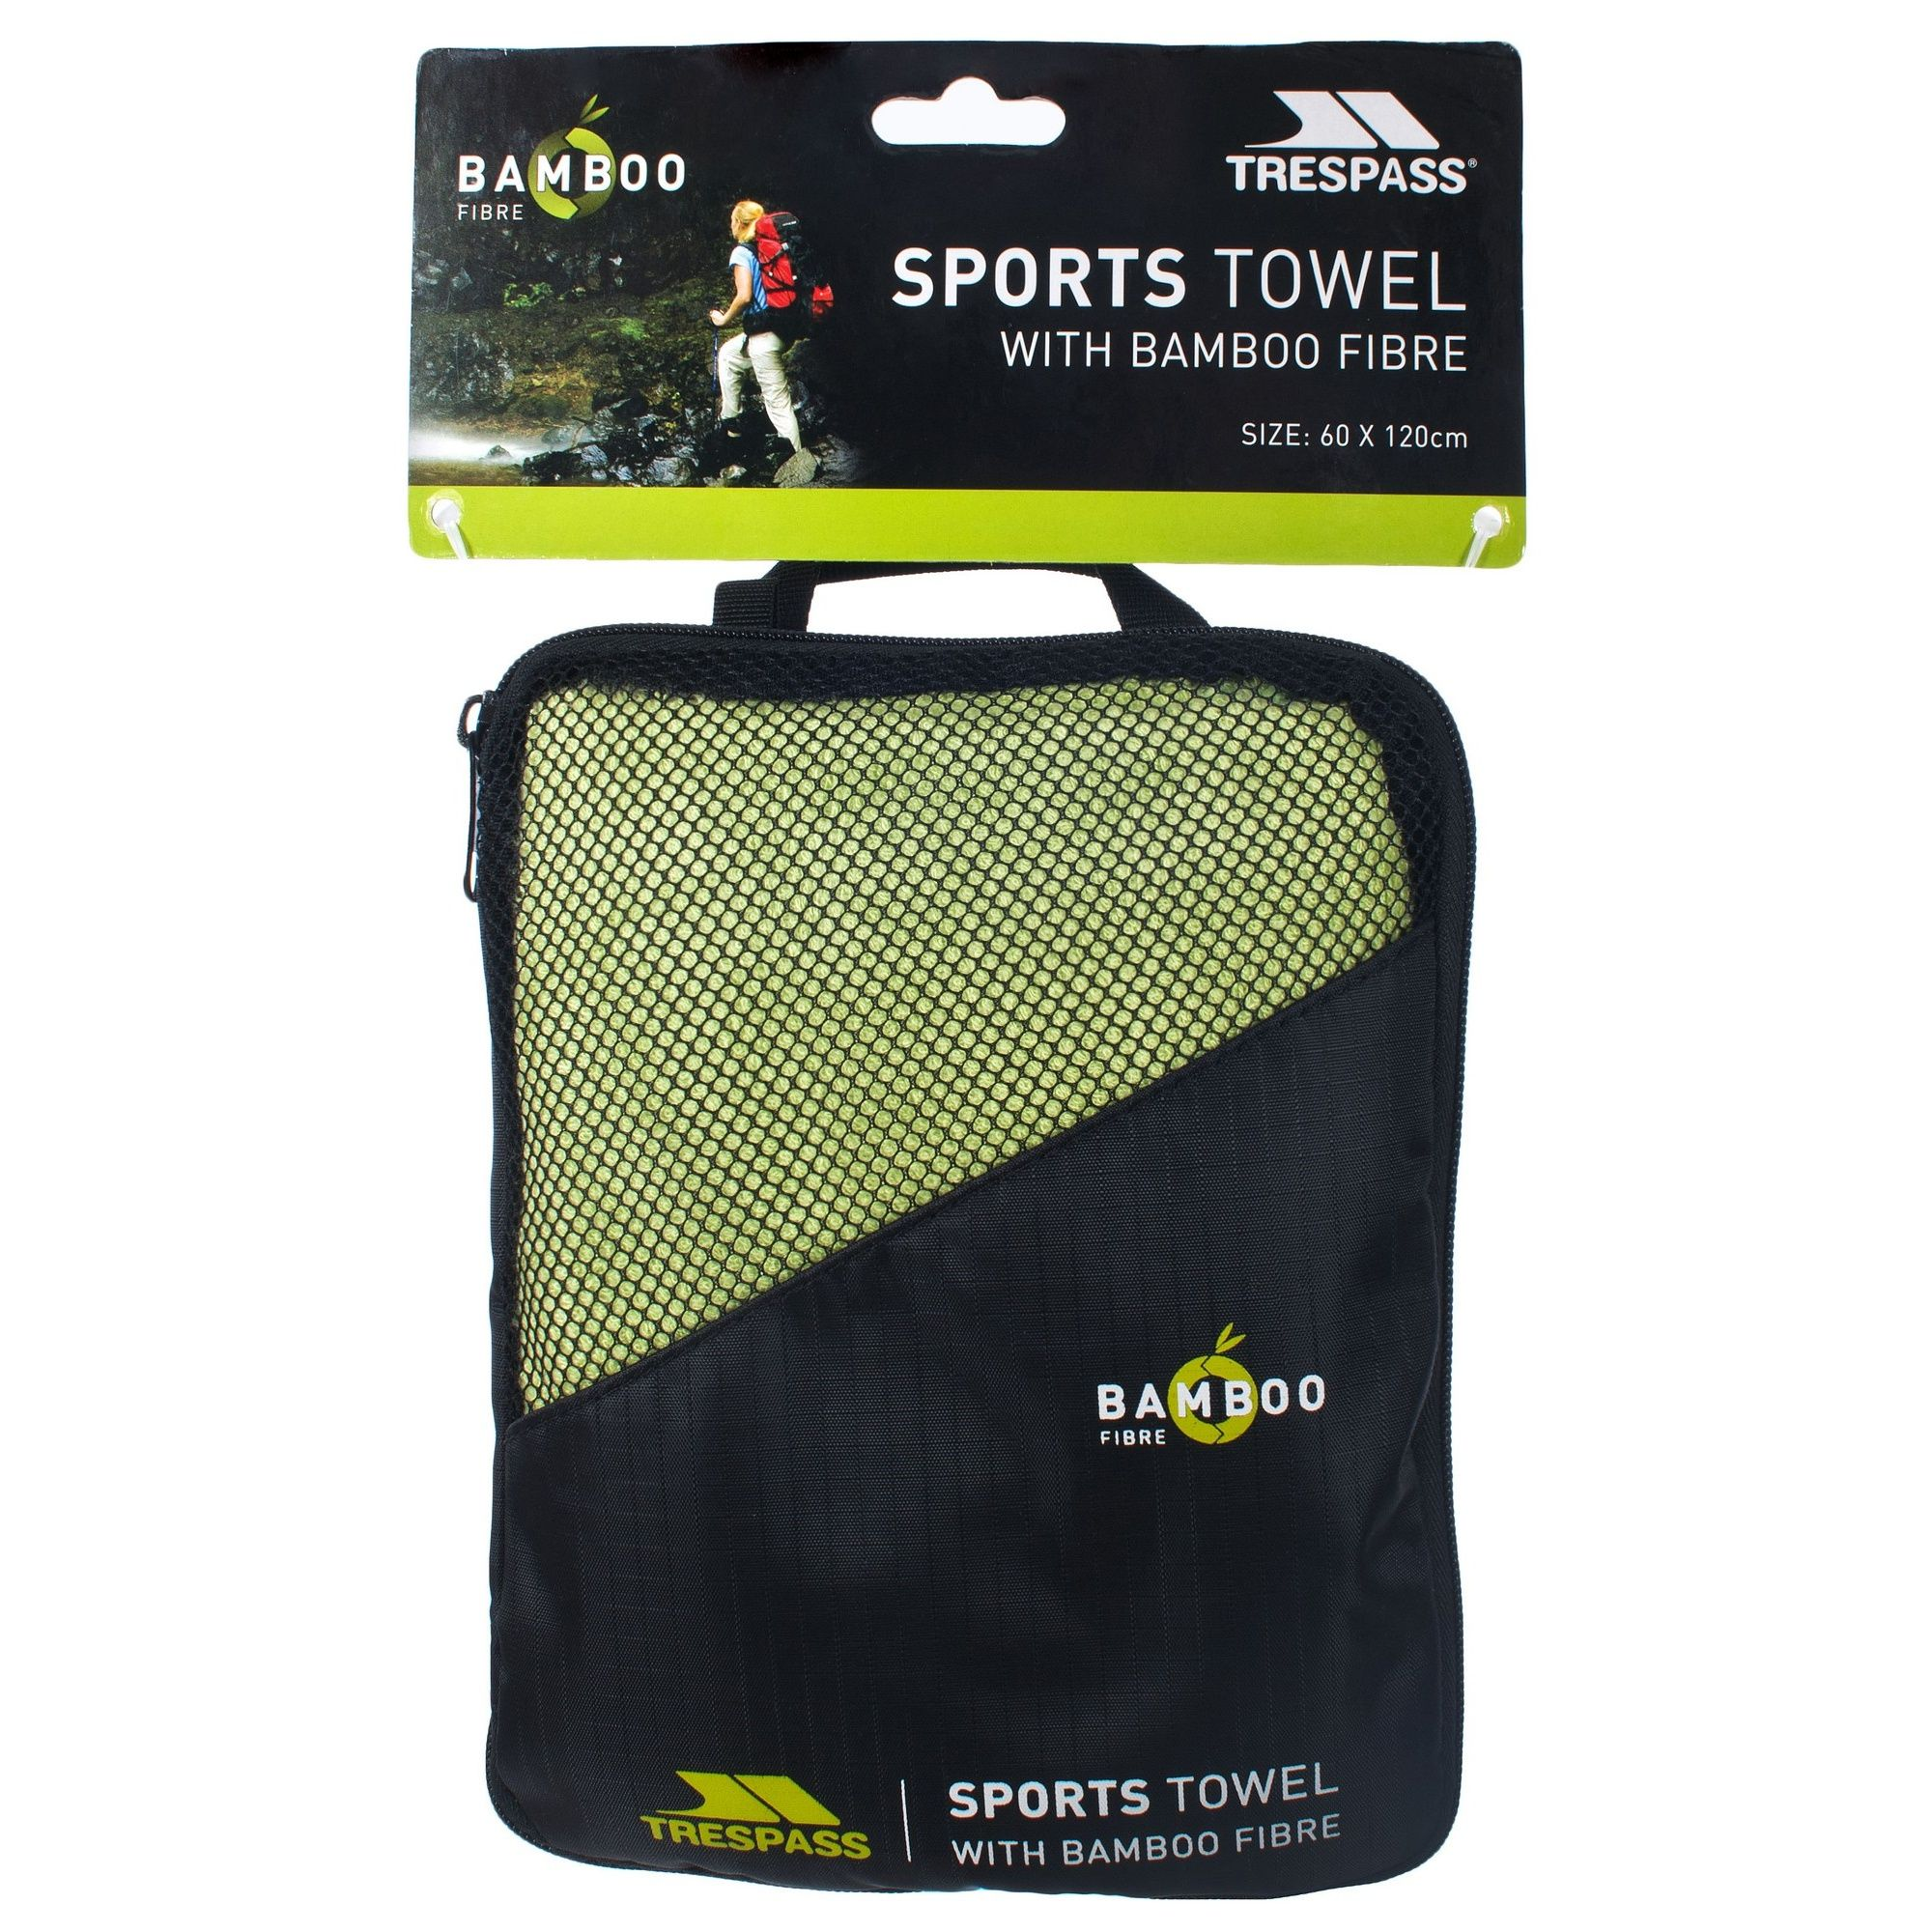 Trespass Wickerman Bamboo Sports Towel